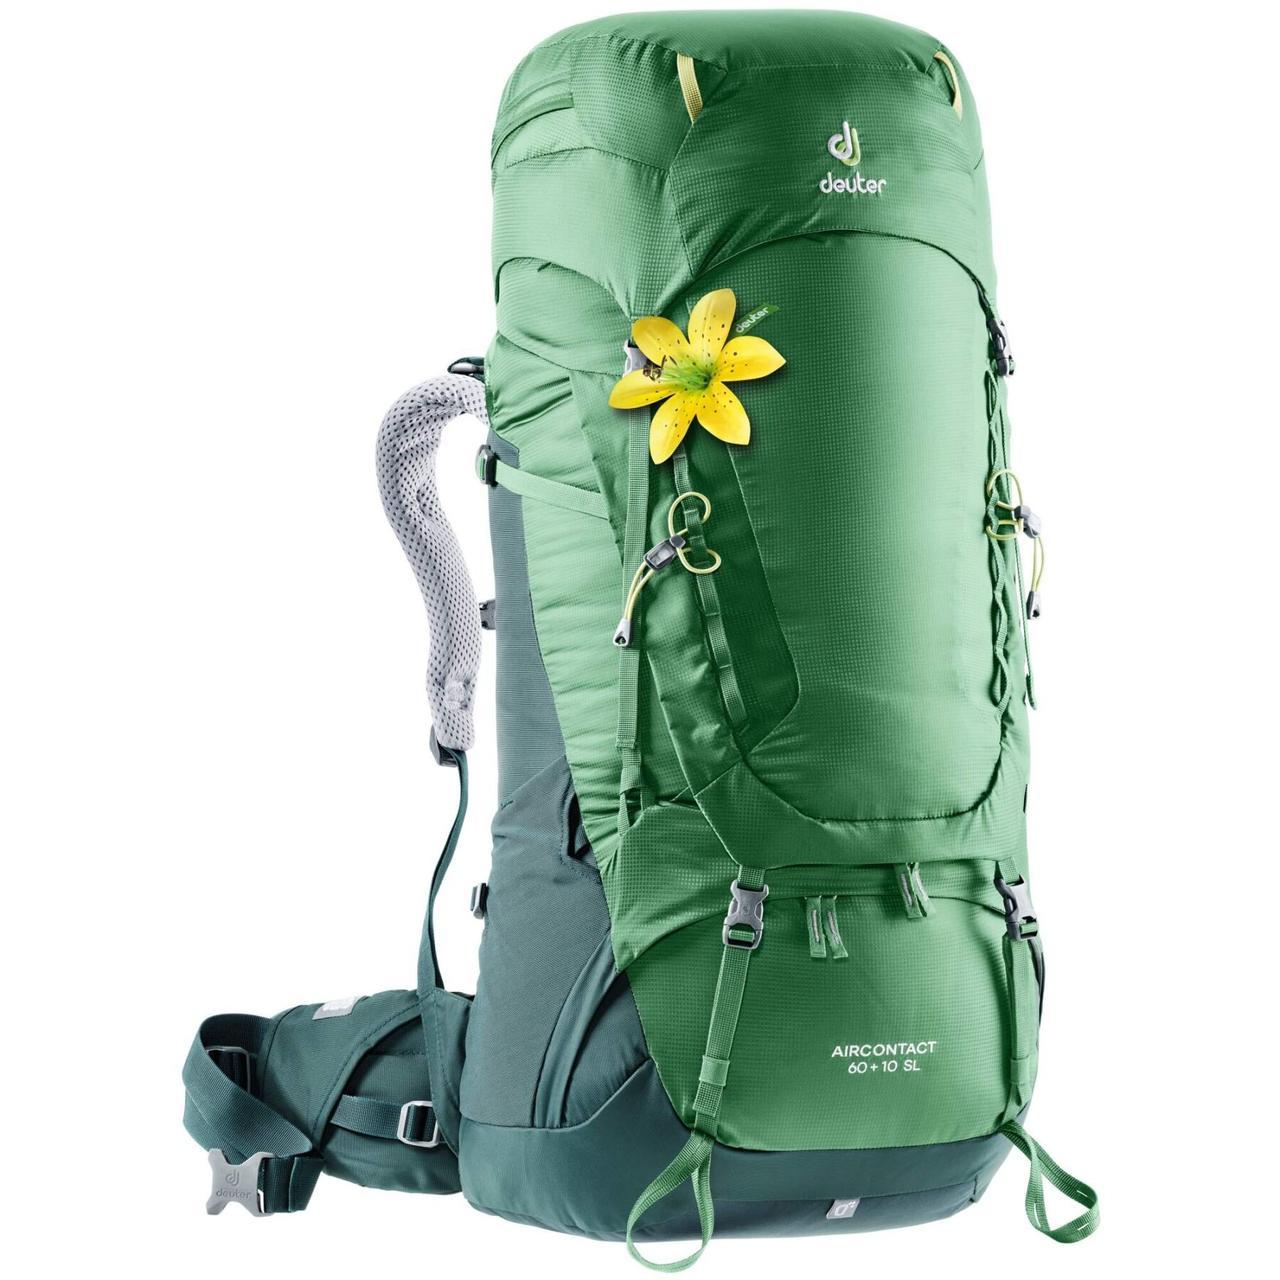 Рюкзак туристический Deuter Aircontact 60+10 SL leaf-forest (3320419 2238)